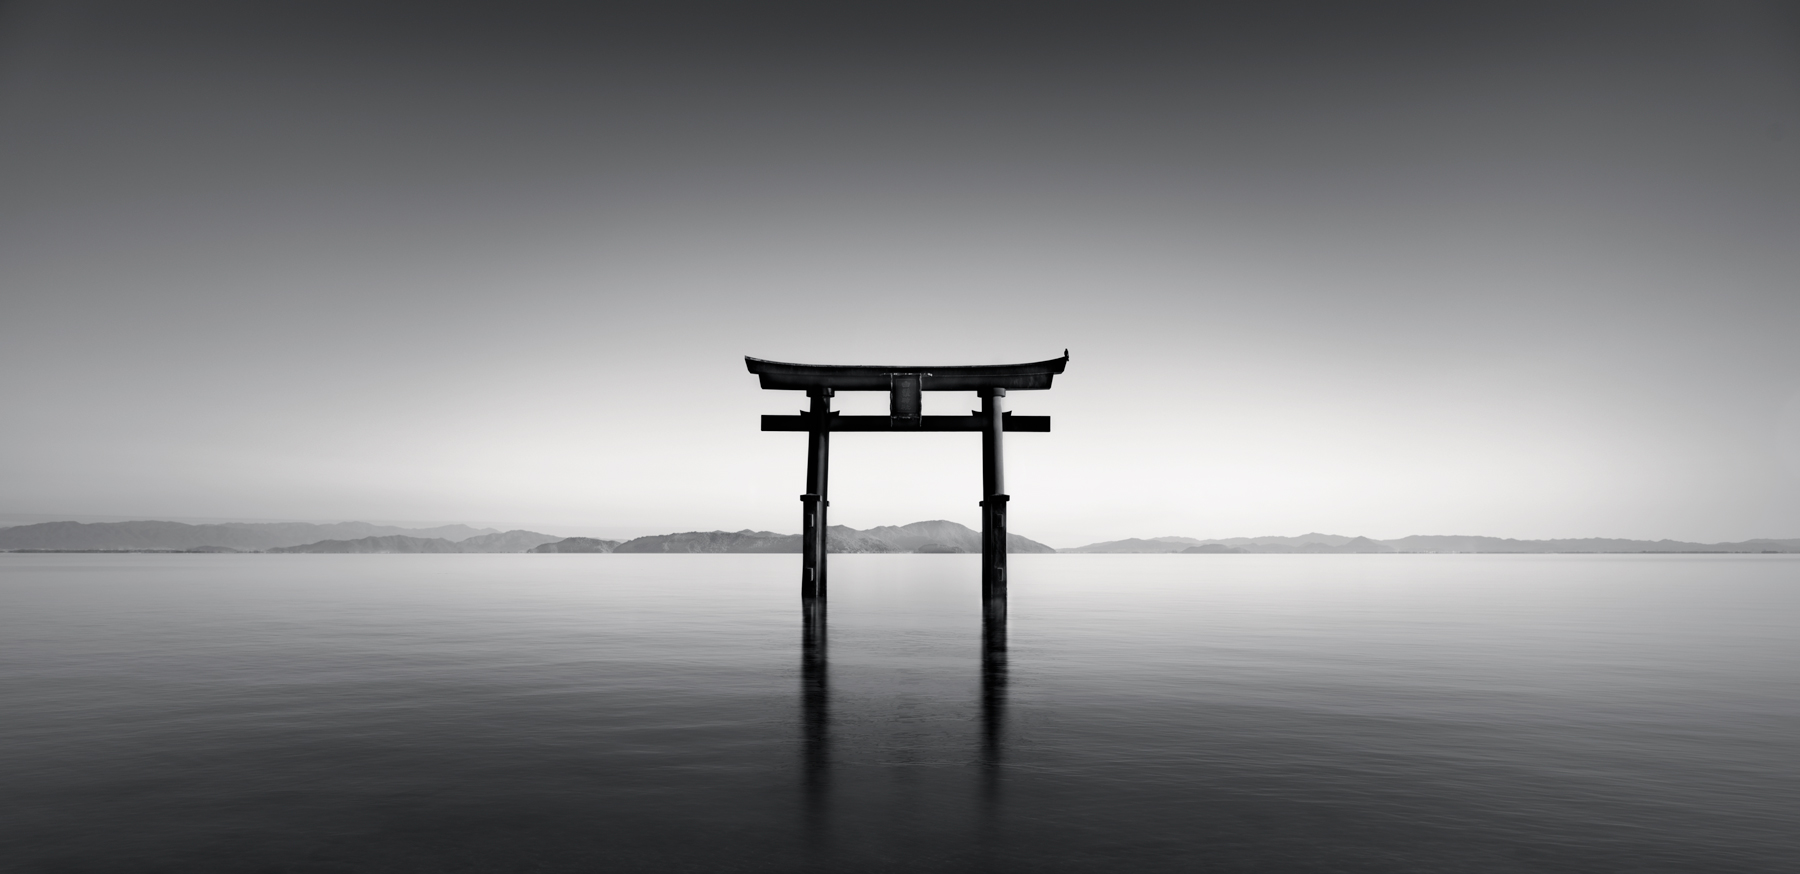 Eriko_Kaniwa_SpiritualLandscape_1.jpg